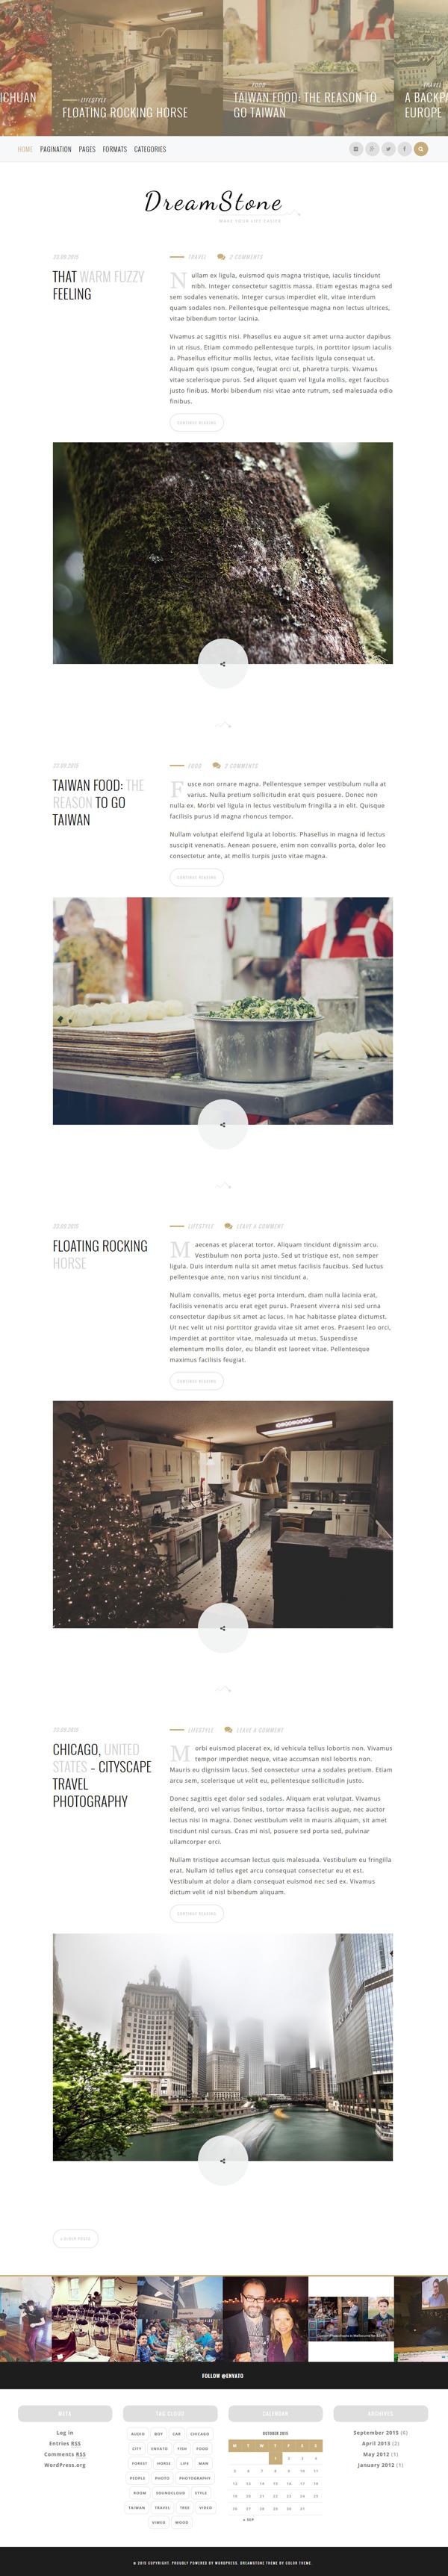 DreamStone - Personal WordPress Blog Theme